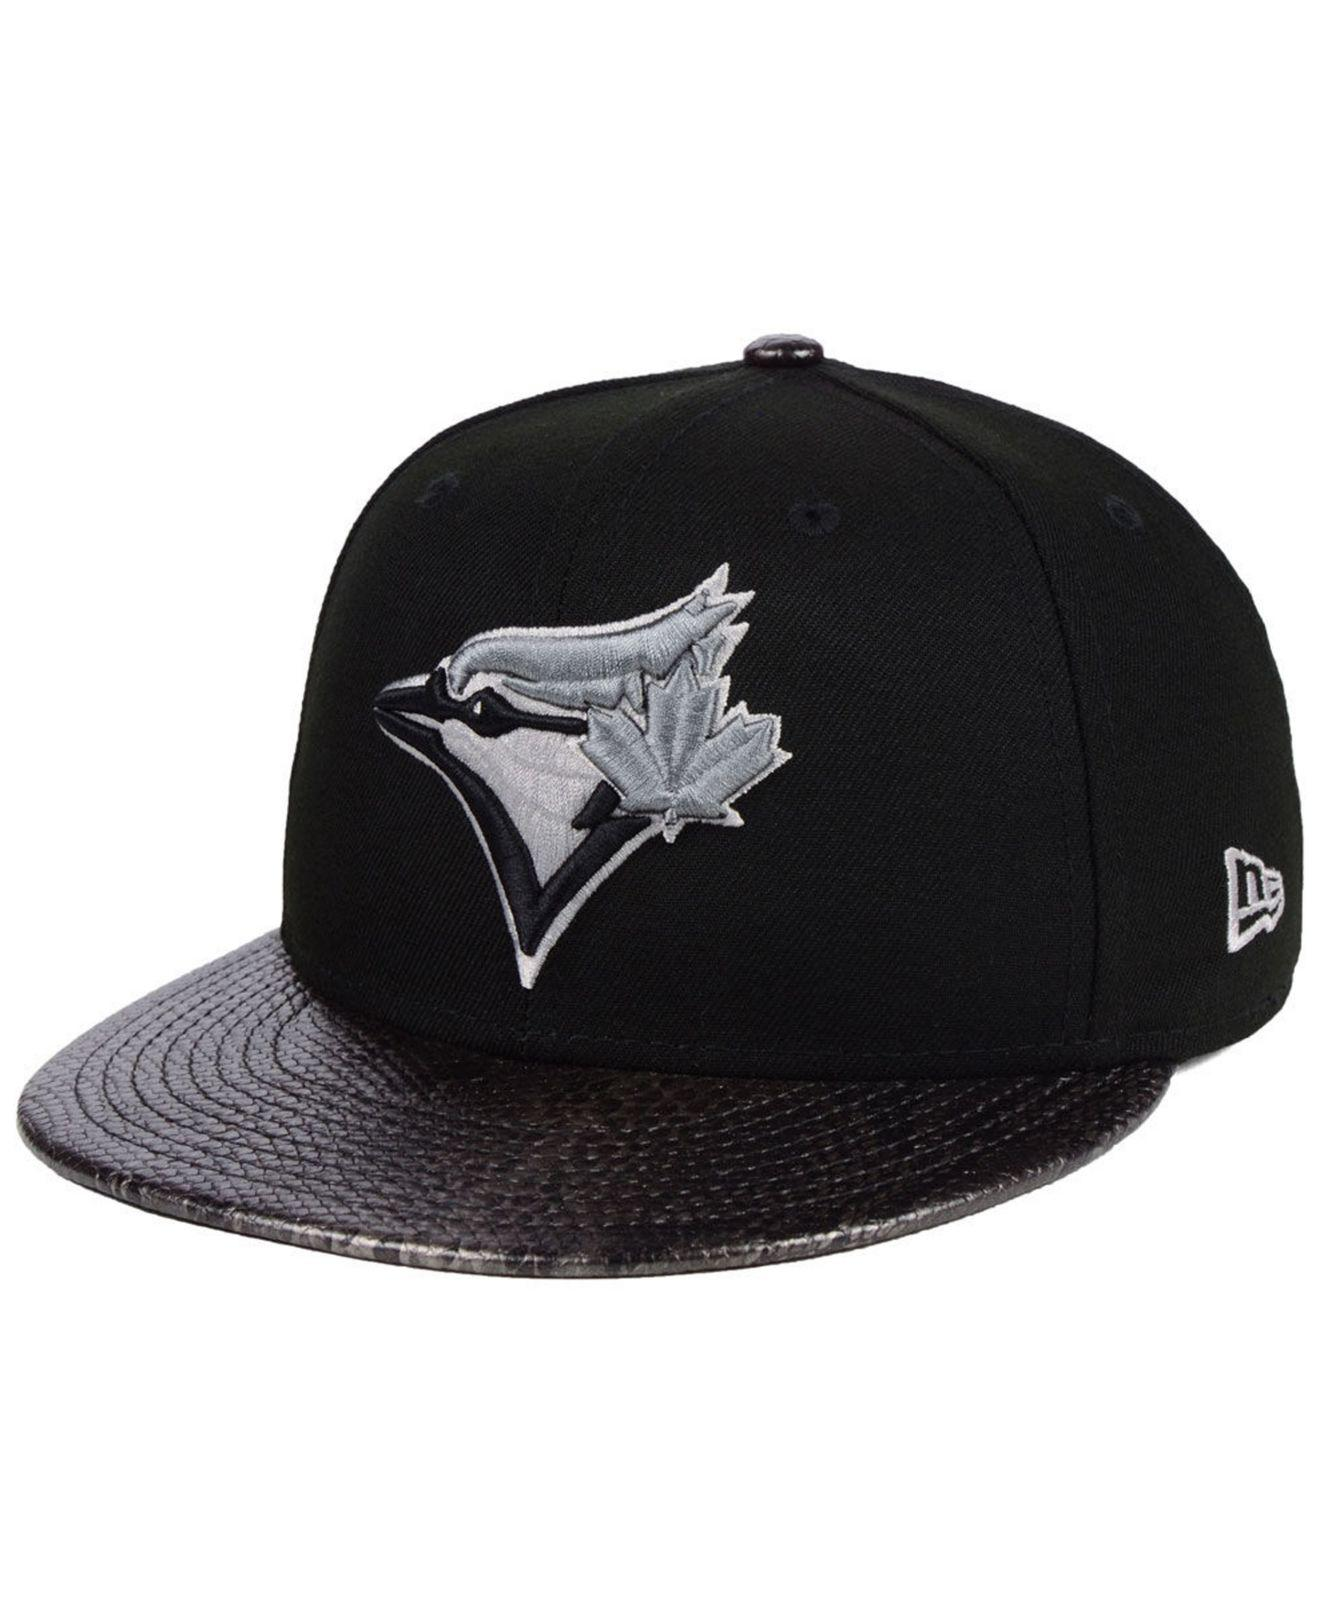 cf2a0e04182 Lyst - KTZ Toronto Blue Jays Snakeskin Sleek 59fifty Fitted Cap in ...